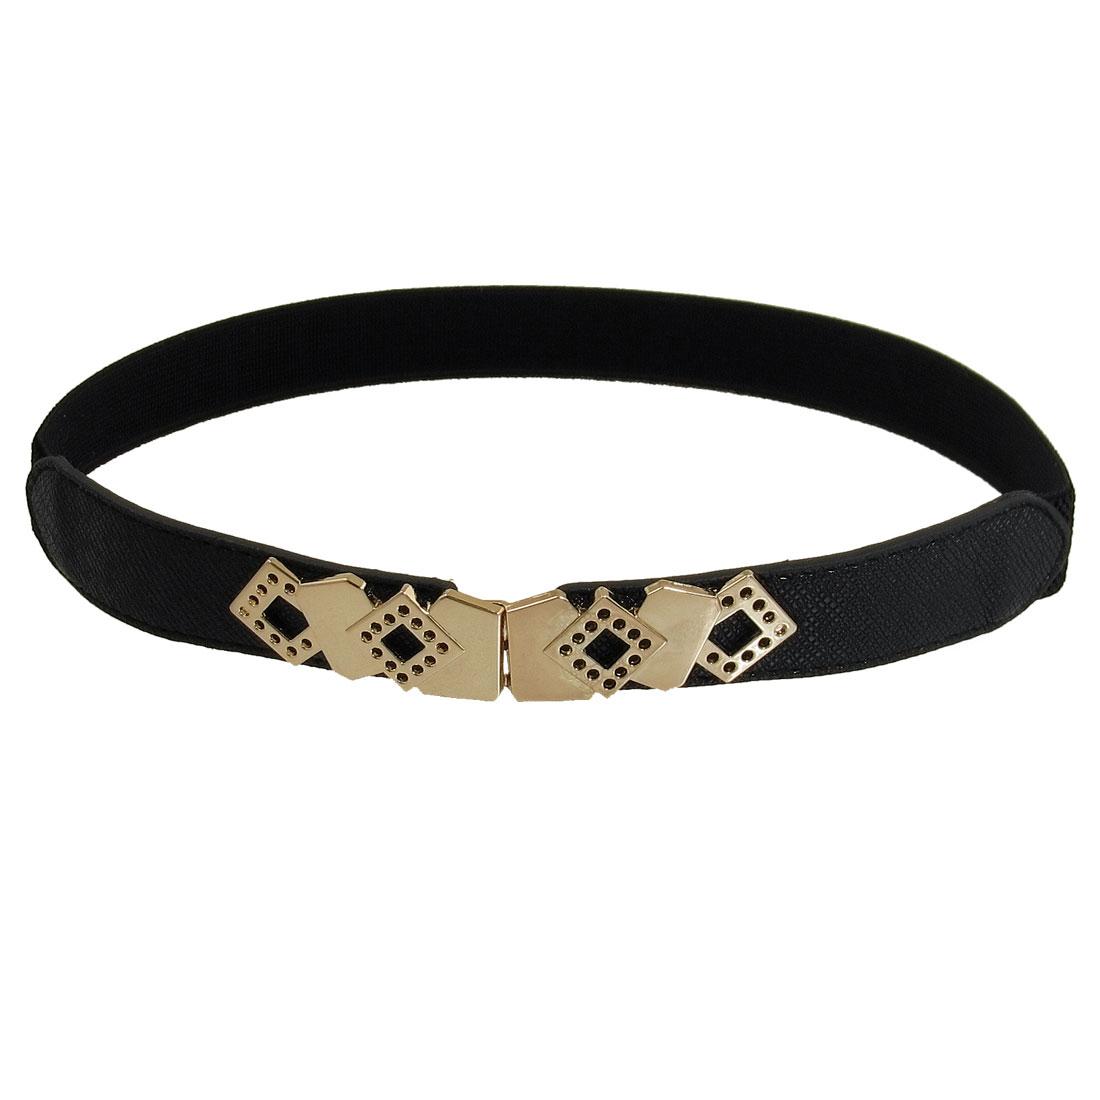 Women Hollow Out Rhombus Design Metal Interlock Buckle Elastic Waist Belt Black